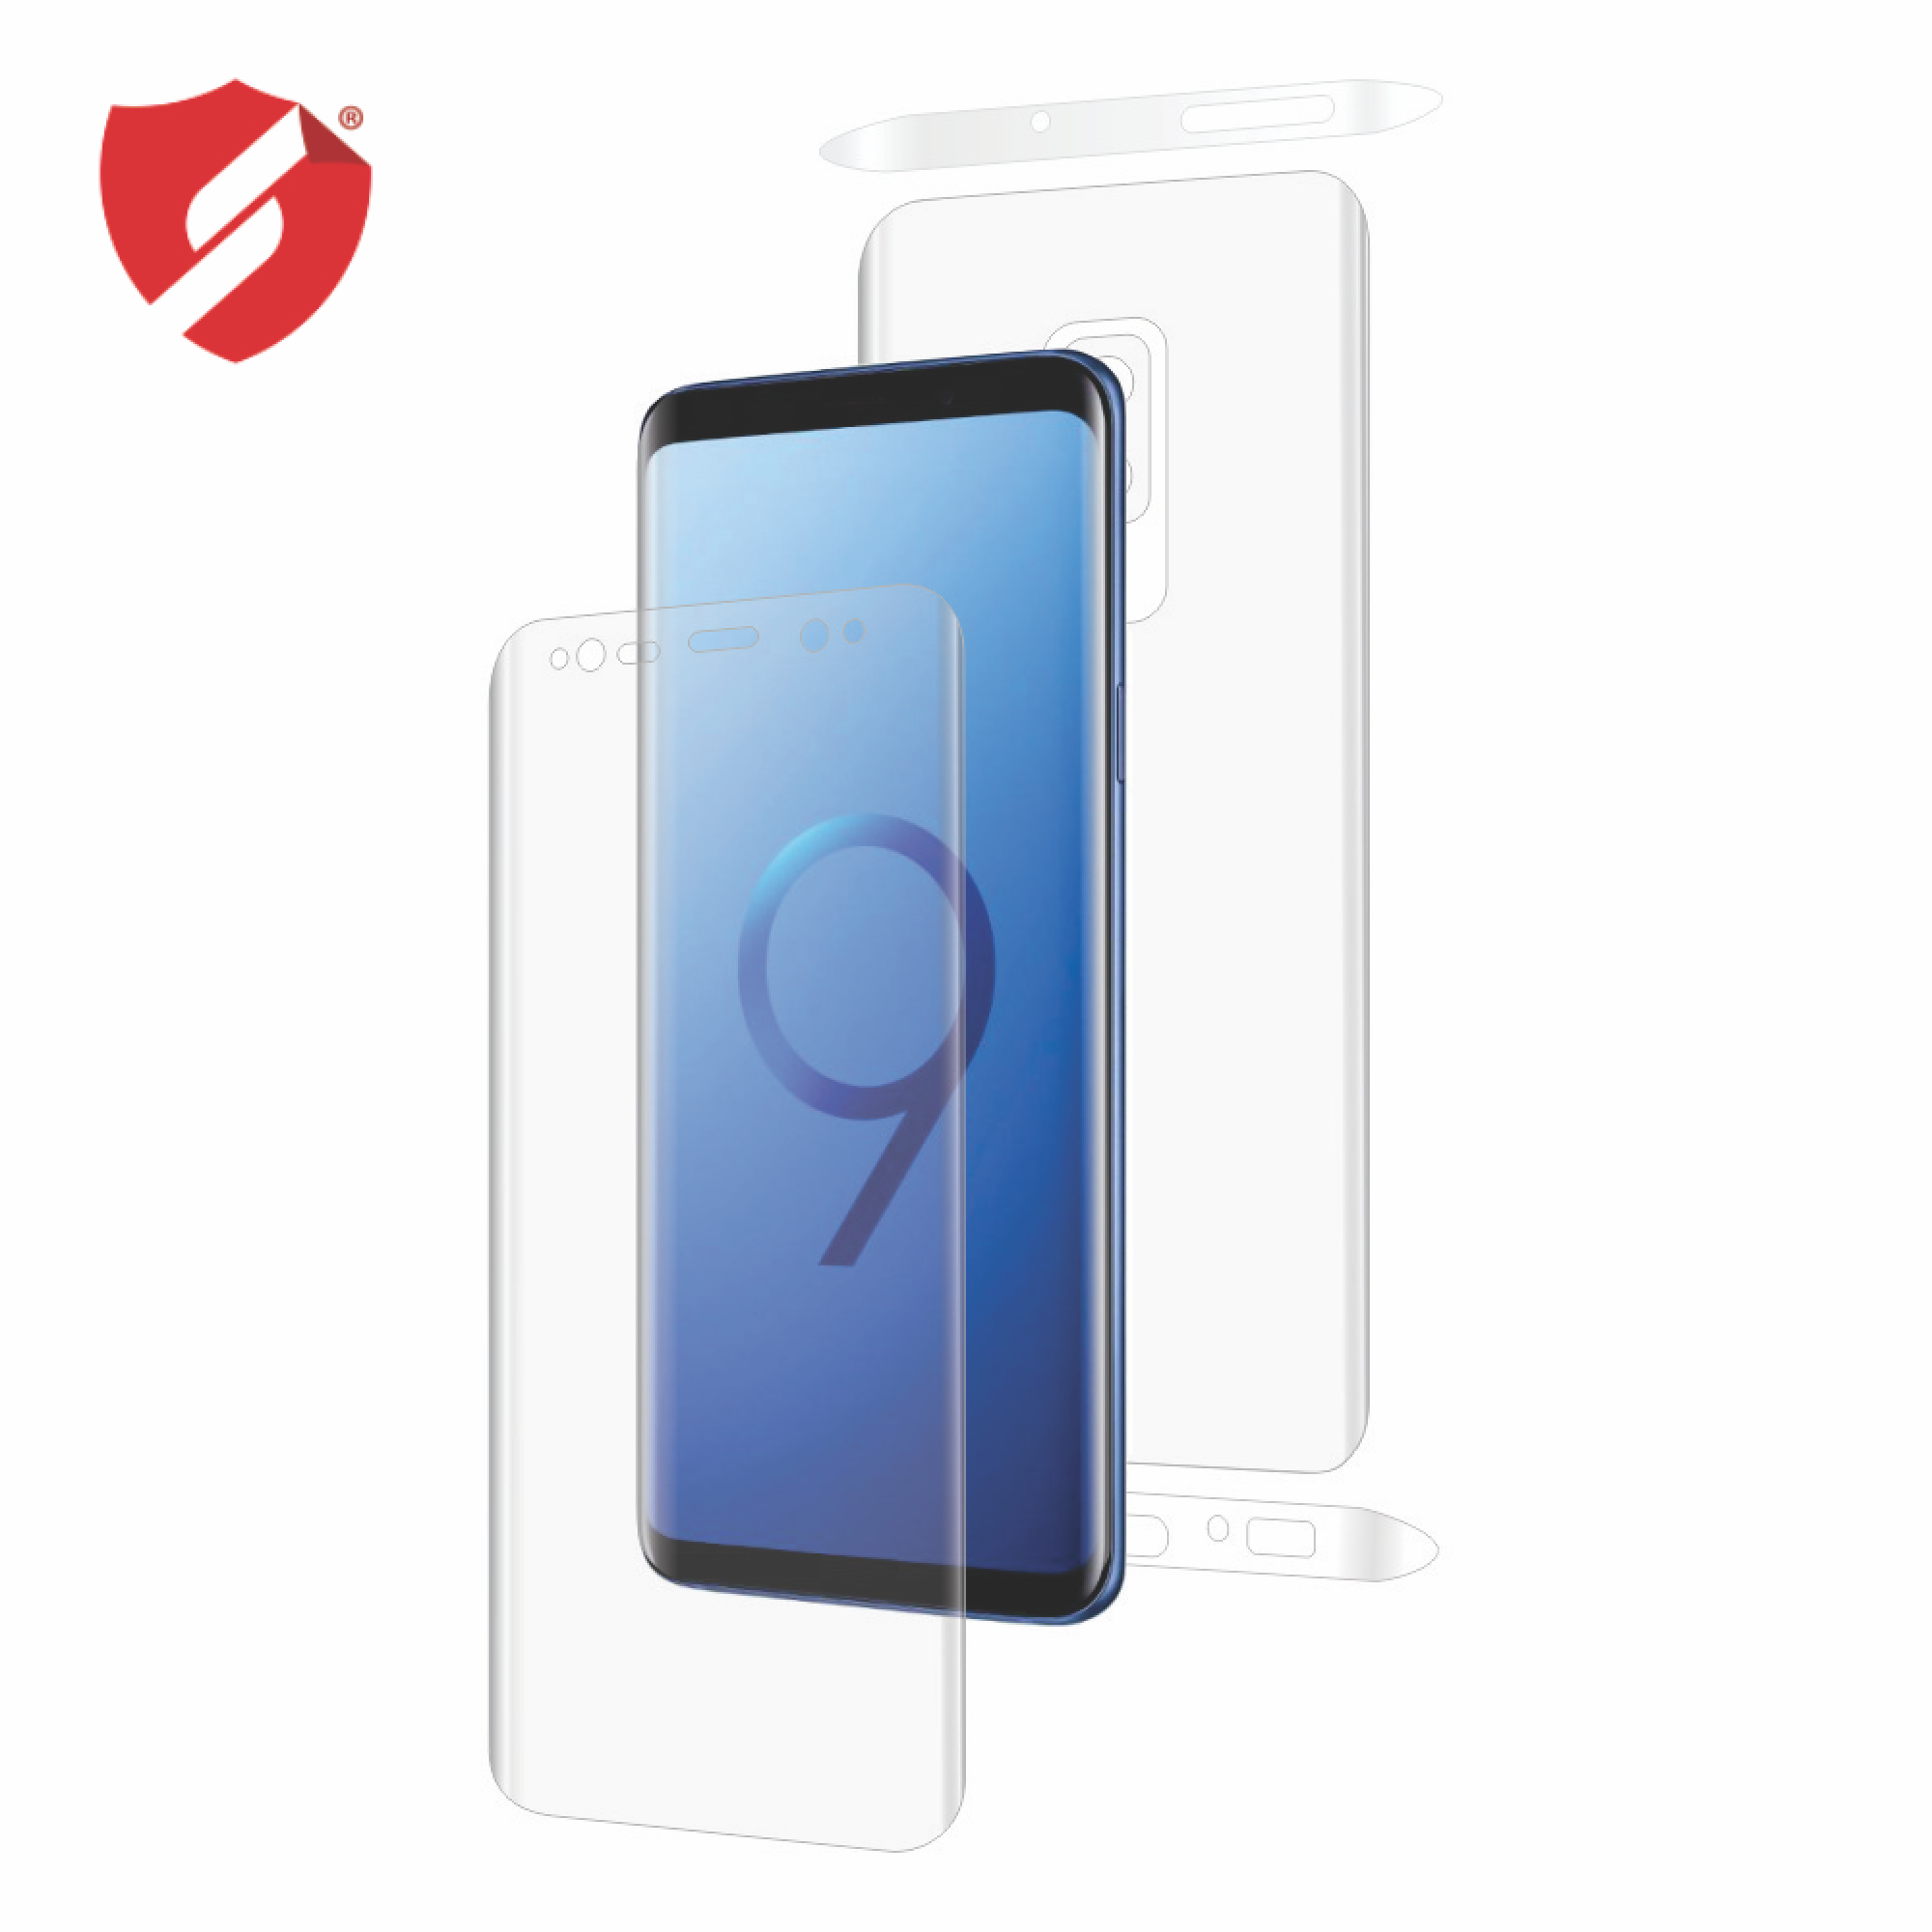 Folie de protectie Smart Protection Samsung Galaxy S9 Plus compatibila cu carcasa Flip Cover - doar-display imagine